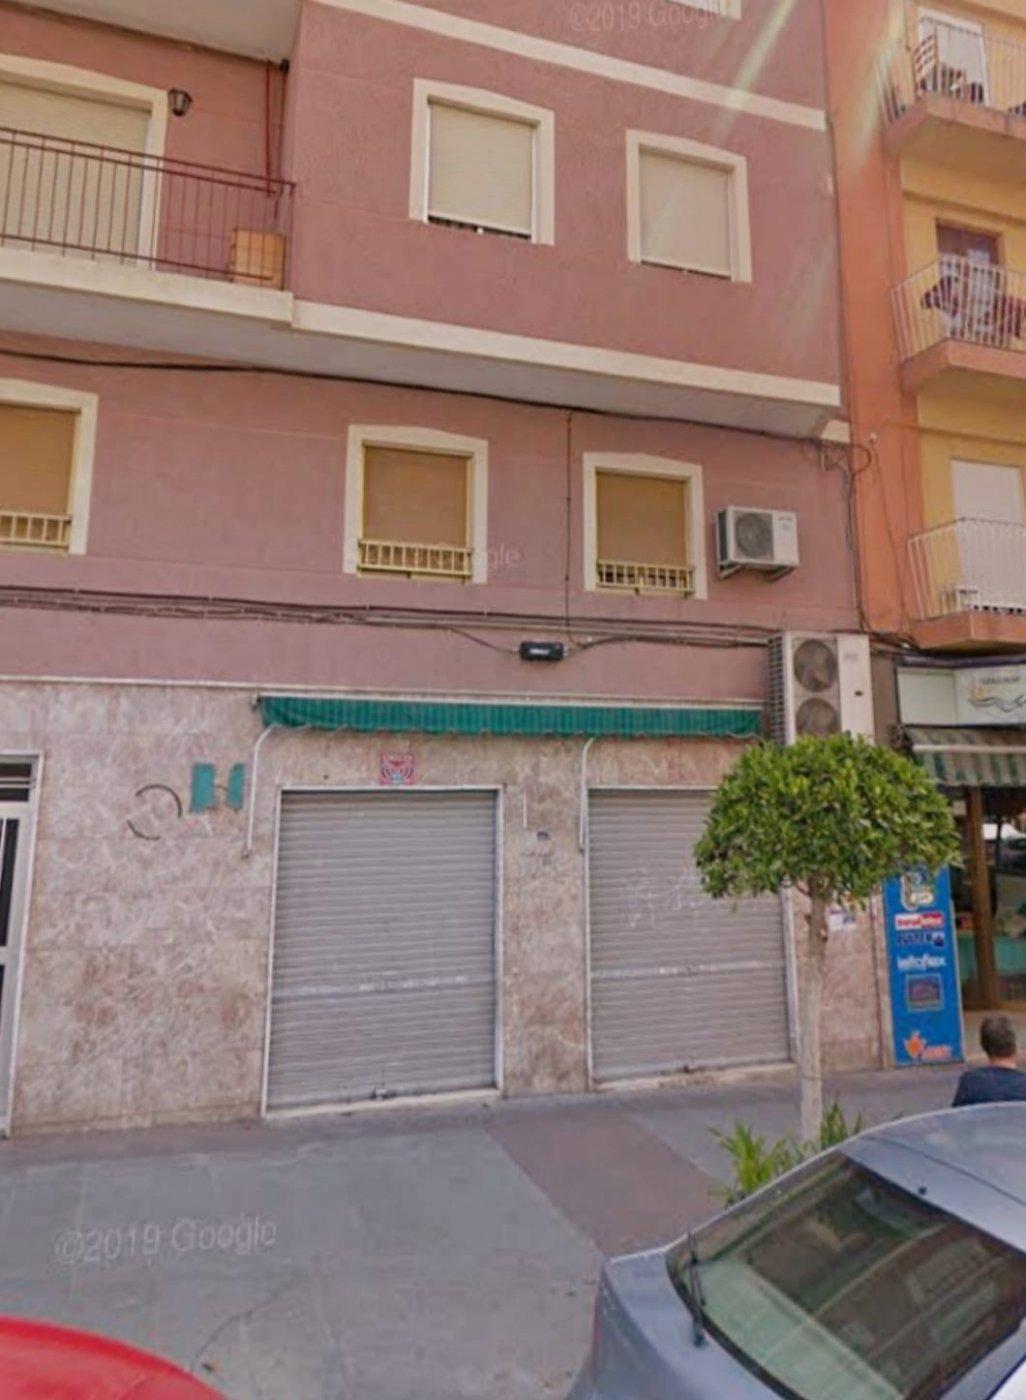 Local Comercial · Elche · Plaza Madrid 700€ MES€